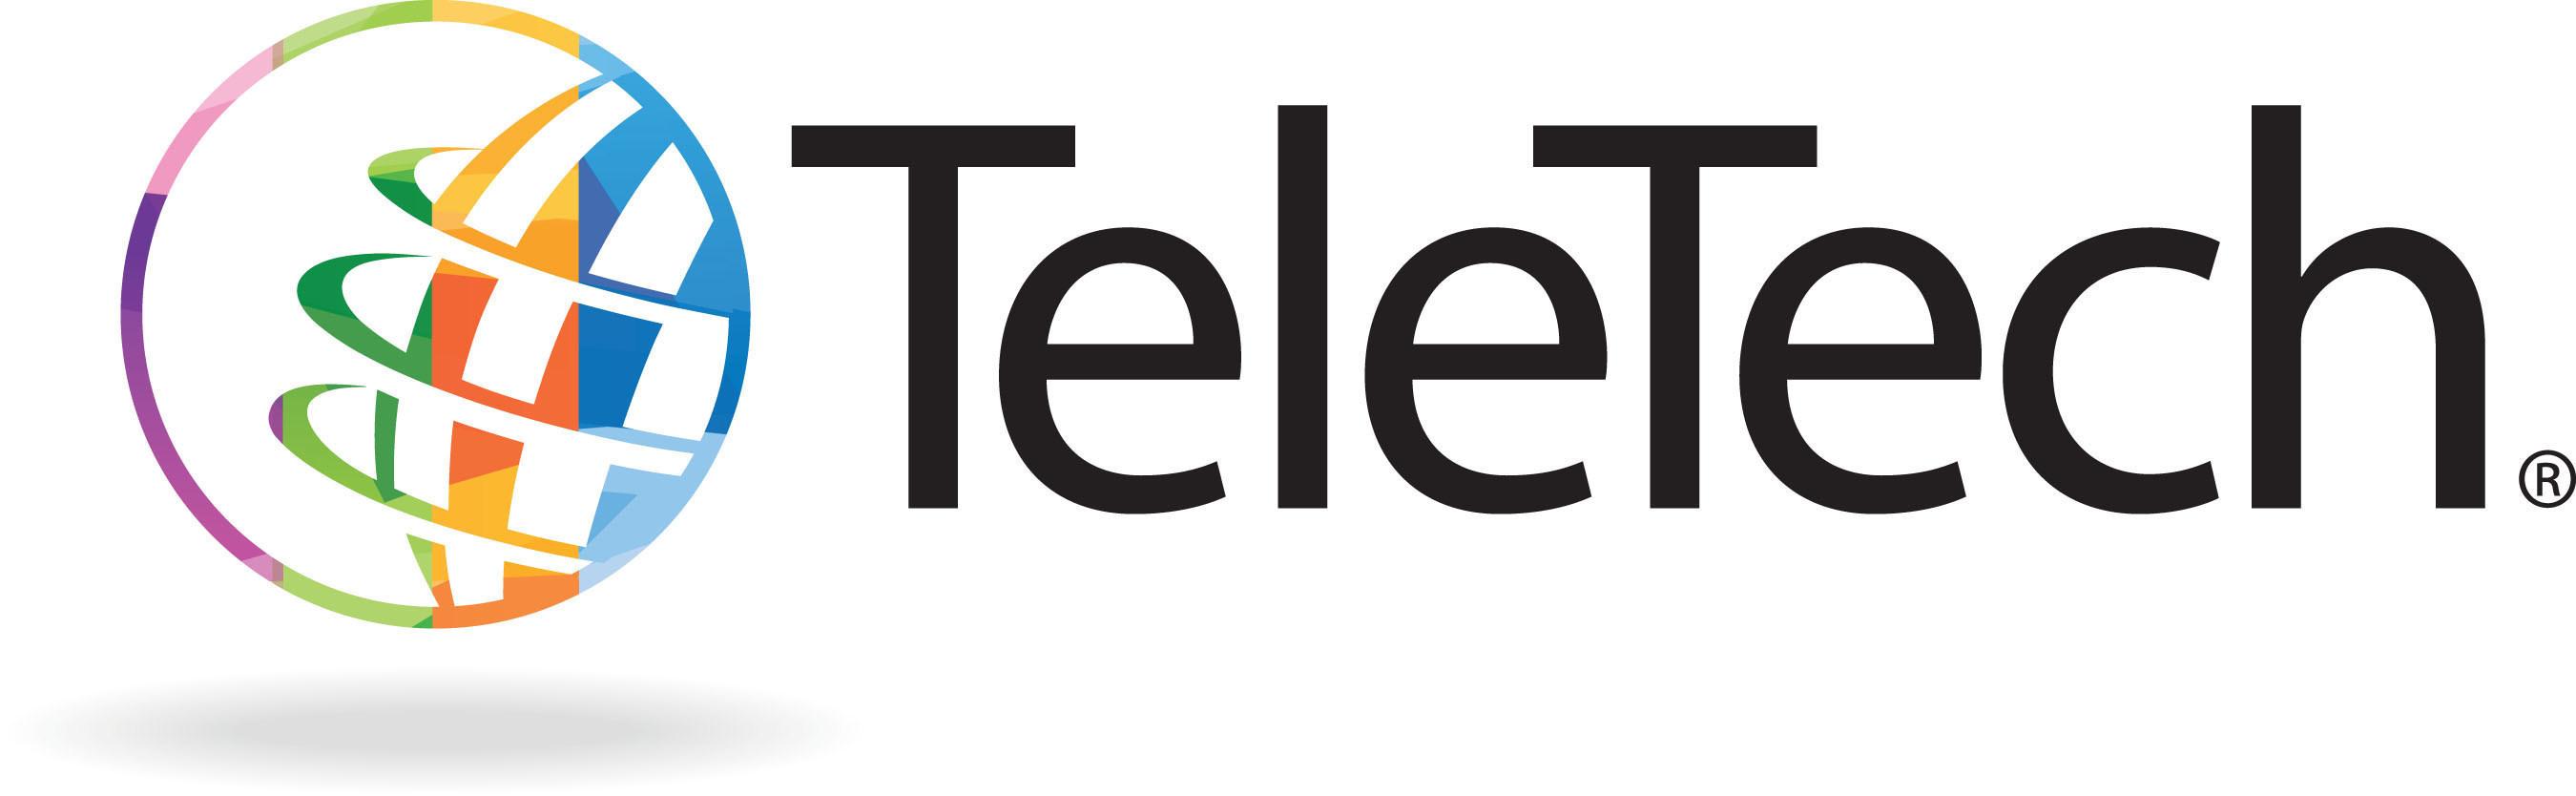 TeleTech Holdings, Inc.  www.TeleTech.com . (PRNewsFoto/TeleTech Holdings, Inc.)